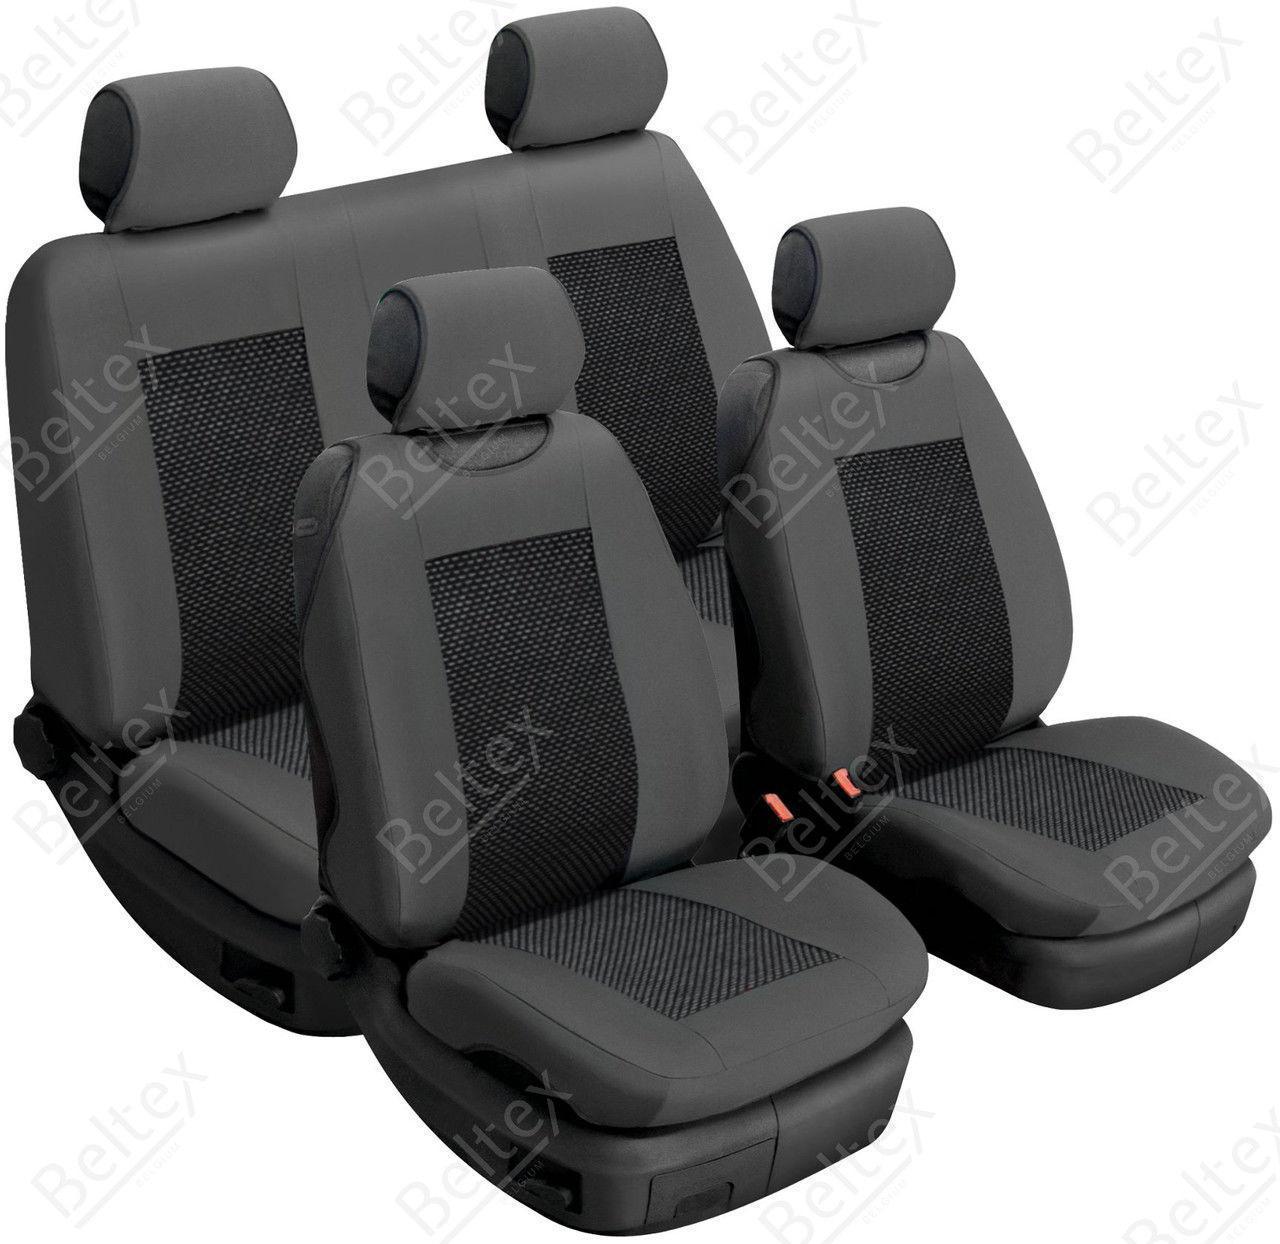 Майки/чехлы на сиденья Ауди Олроуд (Audi Allroad)